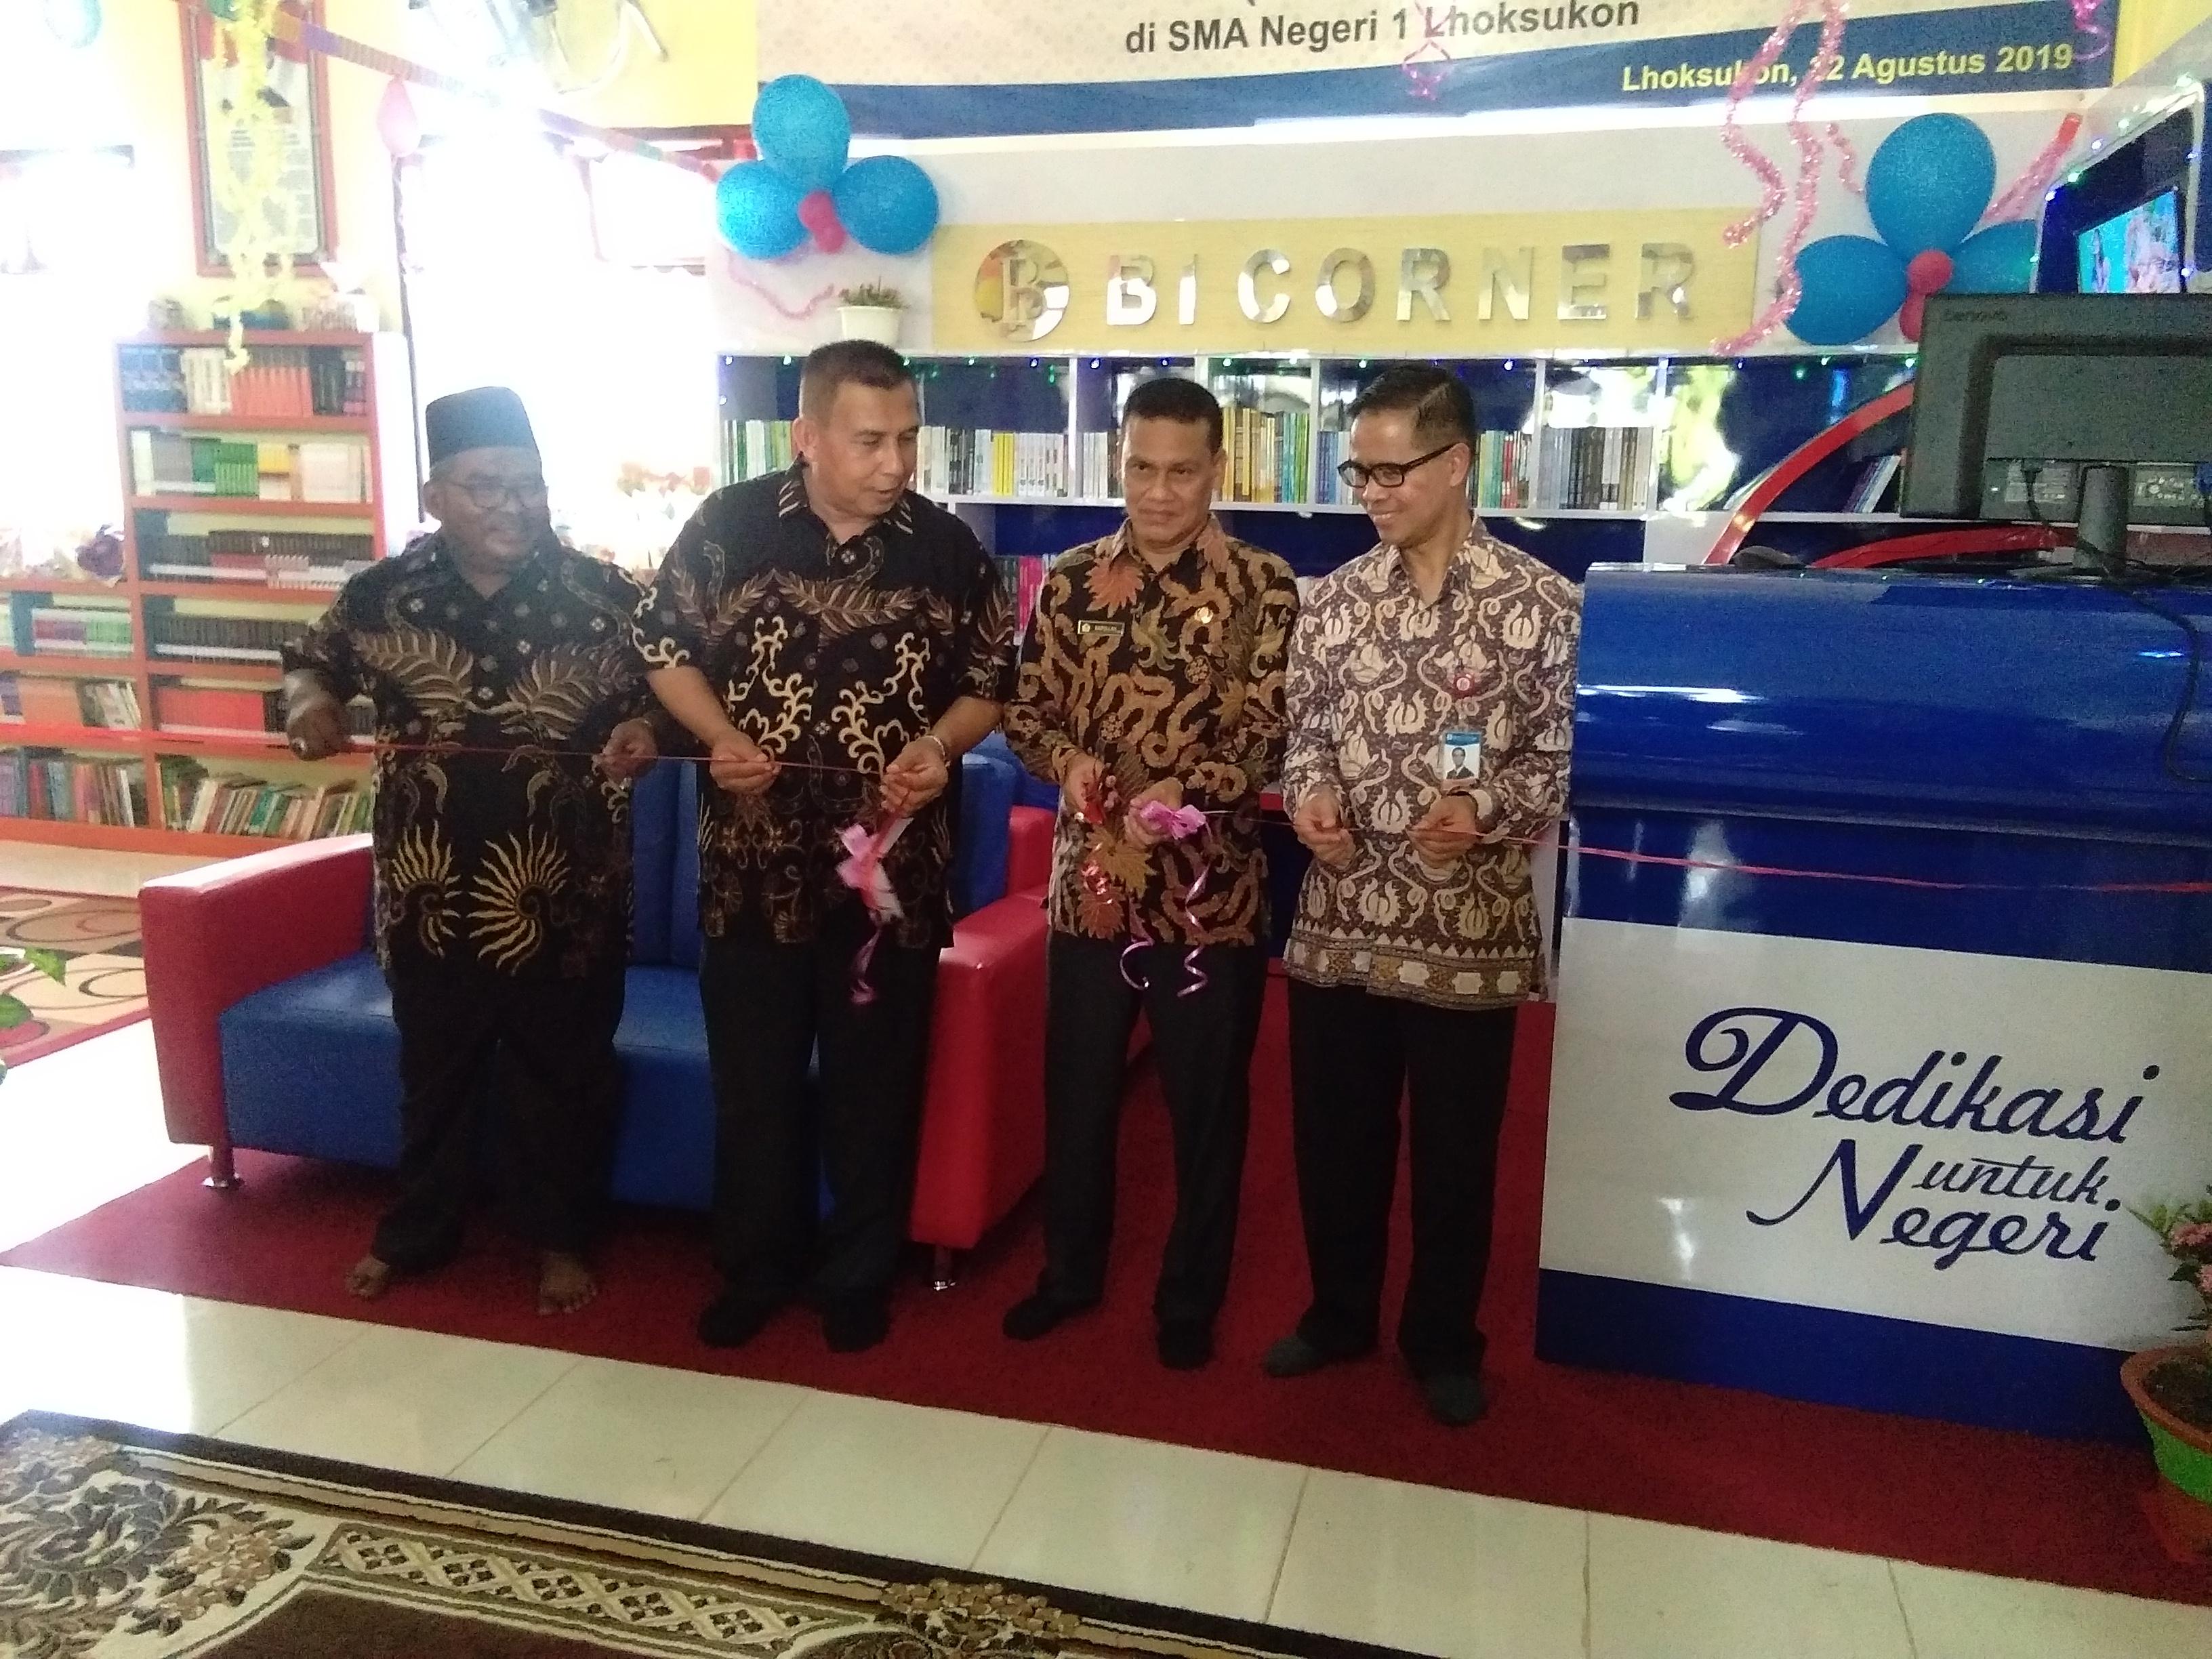 Bank Indonesia Buka BI Corner Perpustakaan SMAN I Lhoksukon